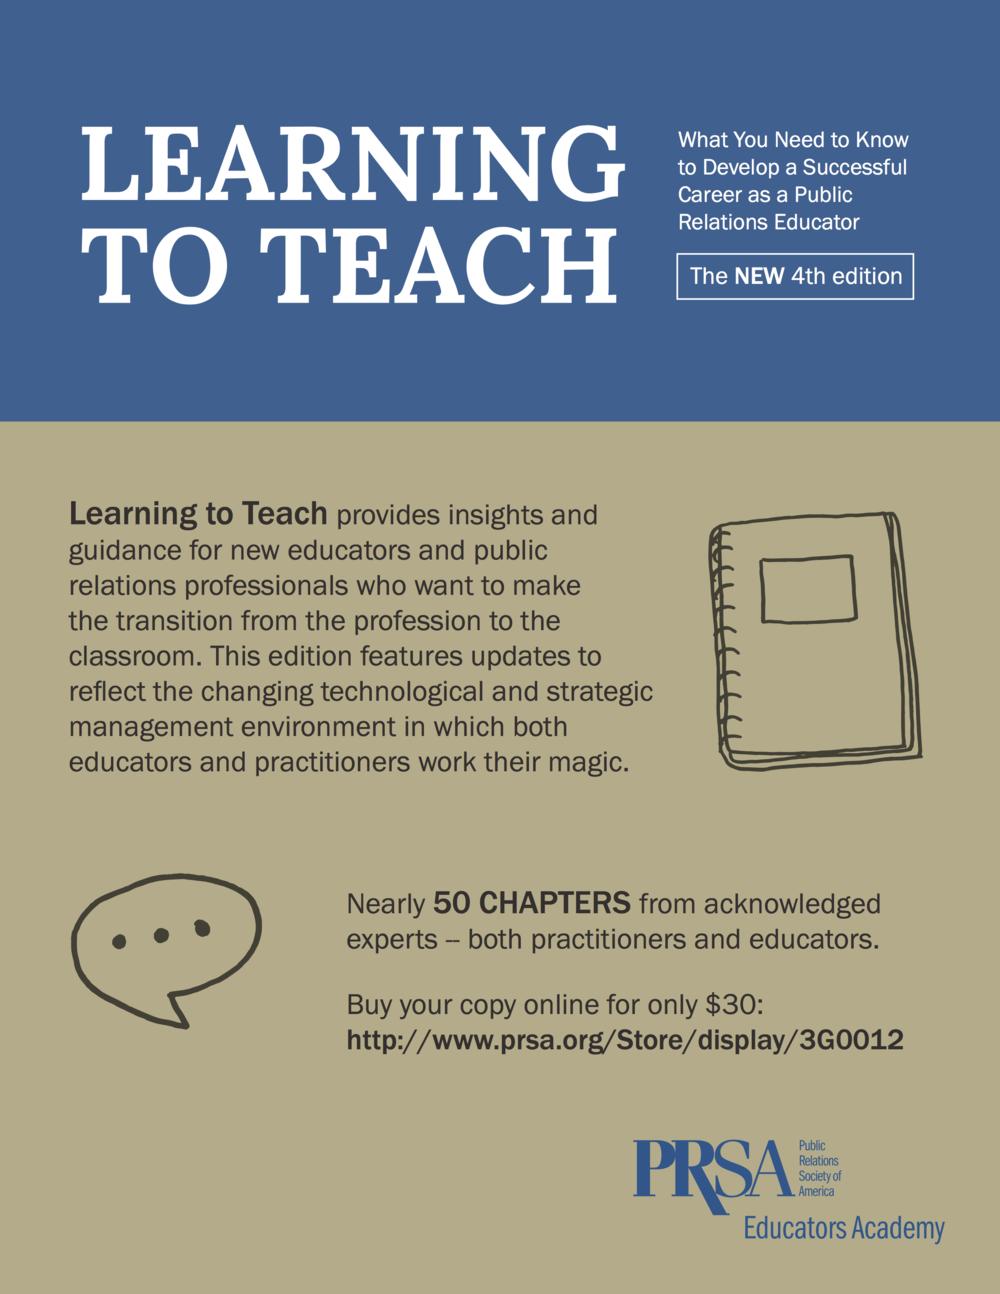 LearningToTeach3.png